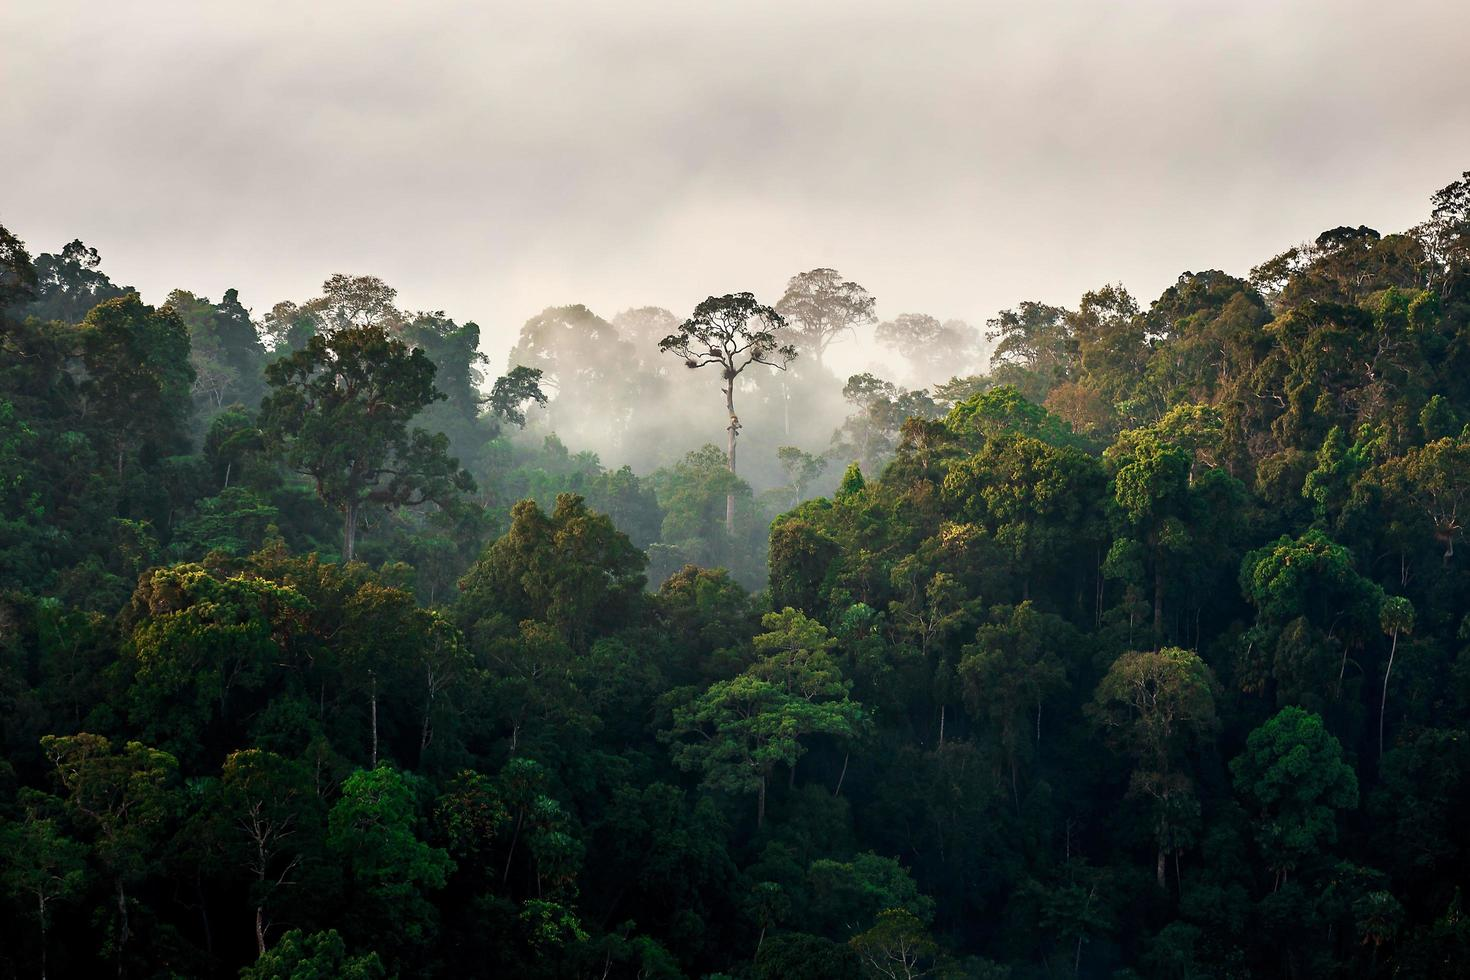 Morning fog in dense tropical rainforest, Kaeng Krachan, Thailand photo